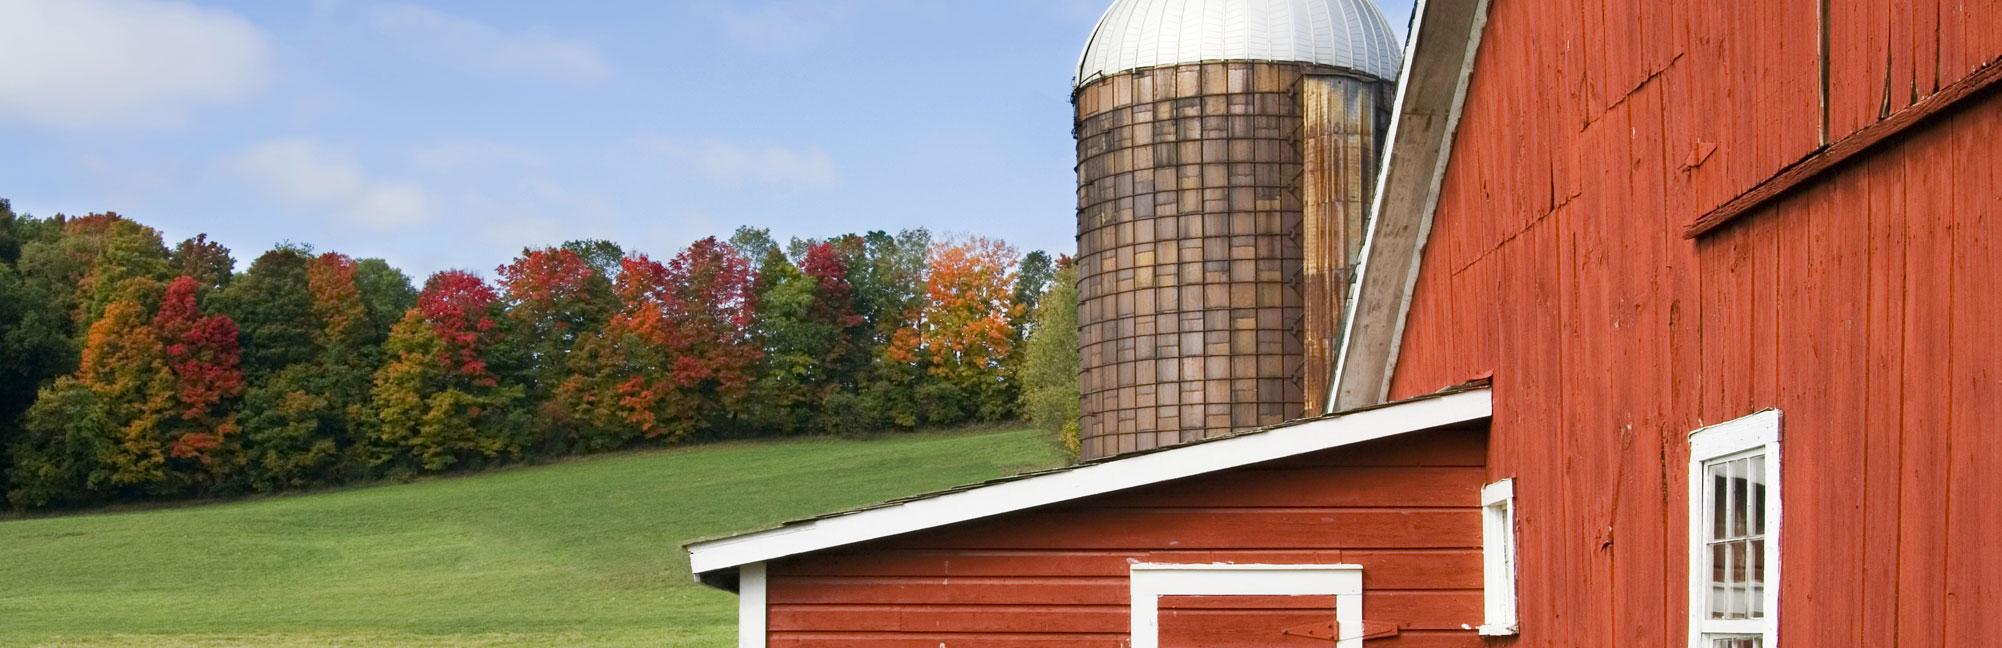 Sb624lfjtsajvexkacfn+barn_silo_autumn_scenery_hero